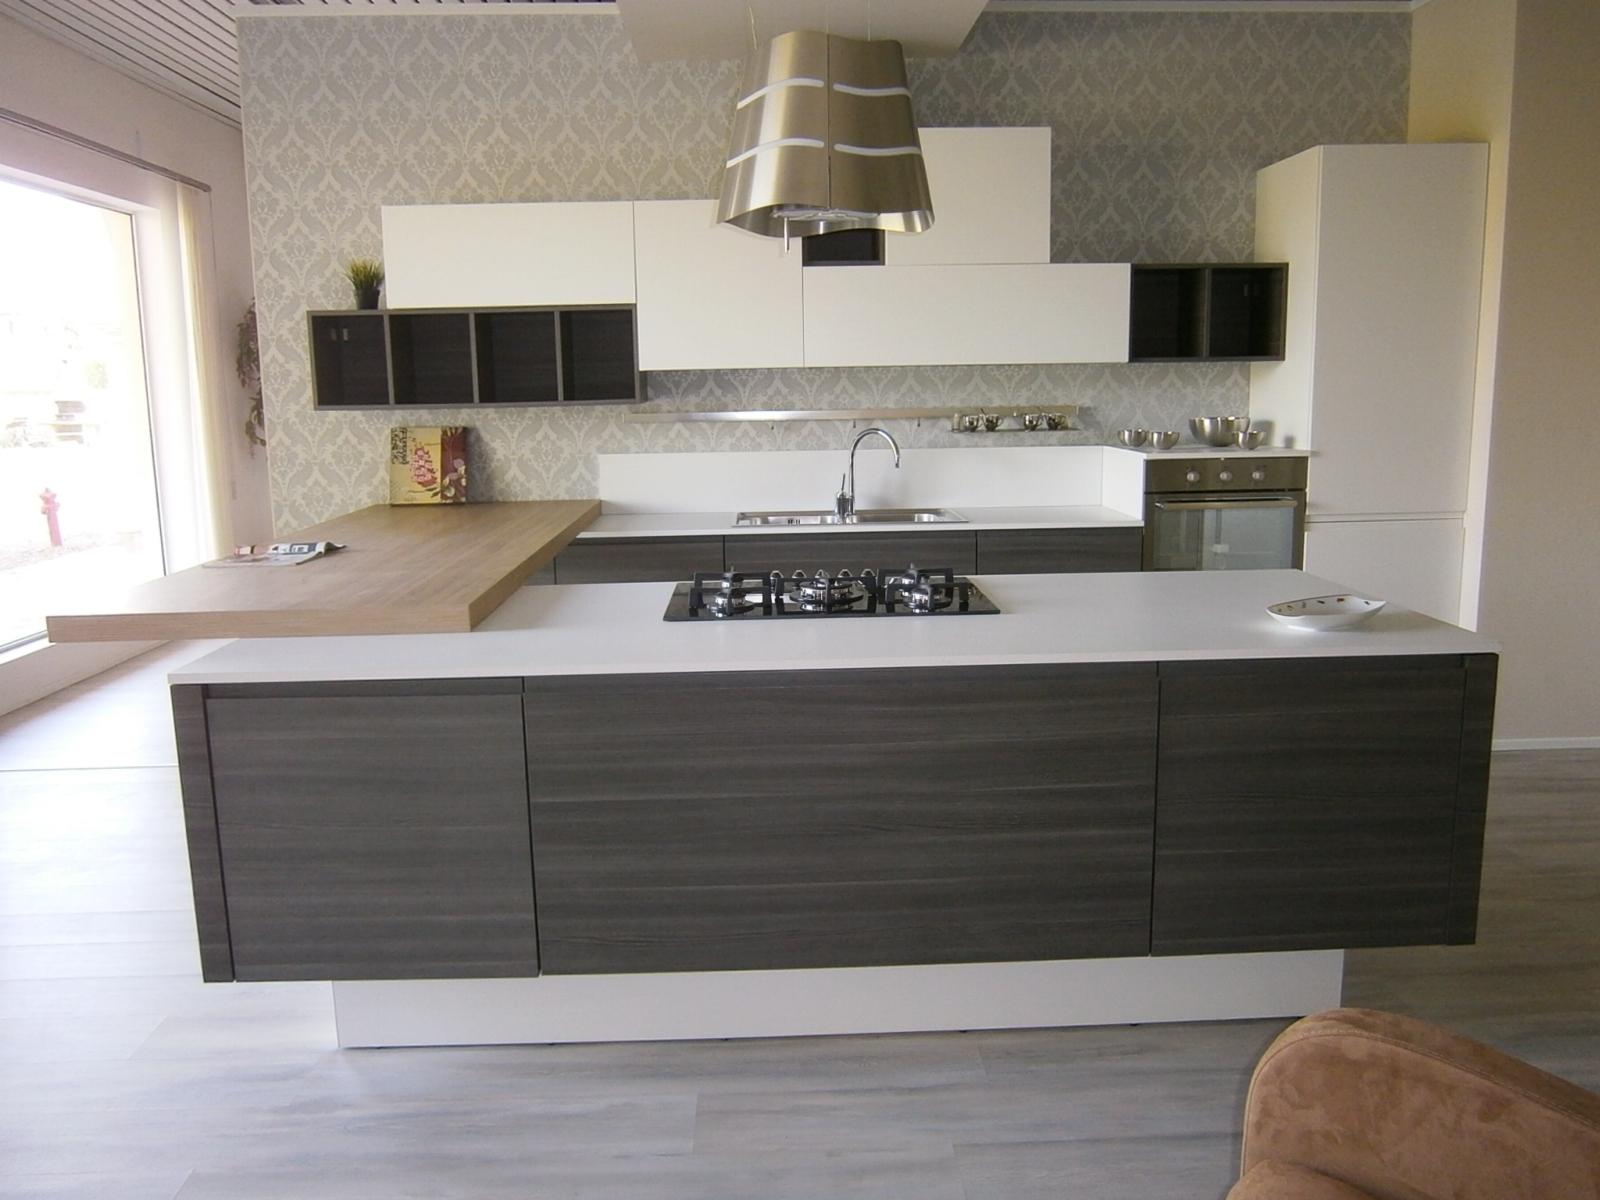 Gallery of cucina arrex arcobaleno scontato del with cucine cappellini - Cappellini cucine ...